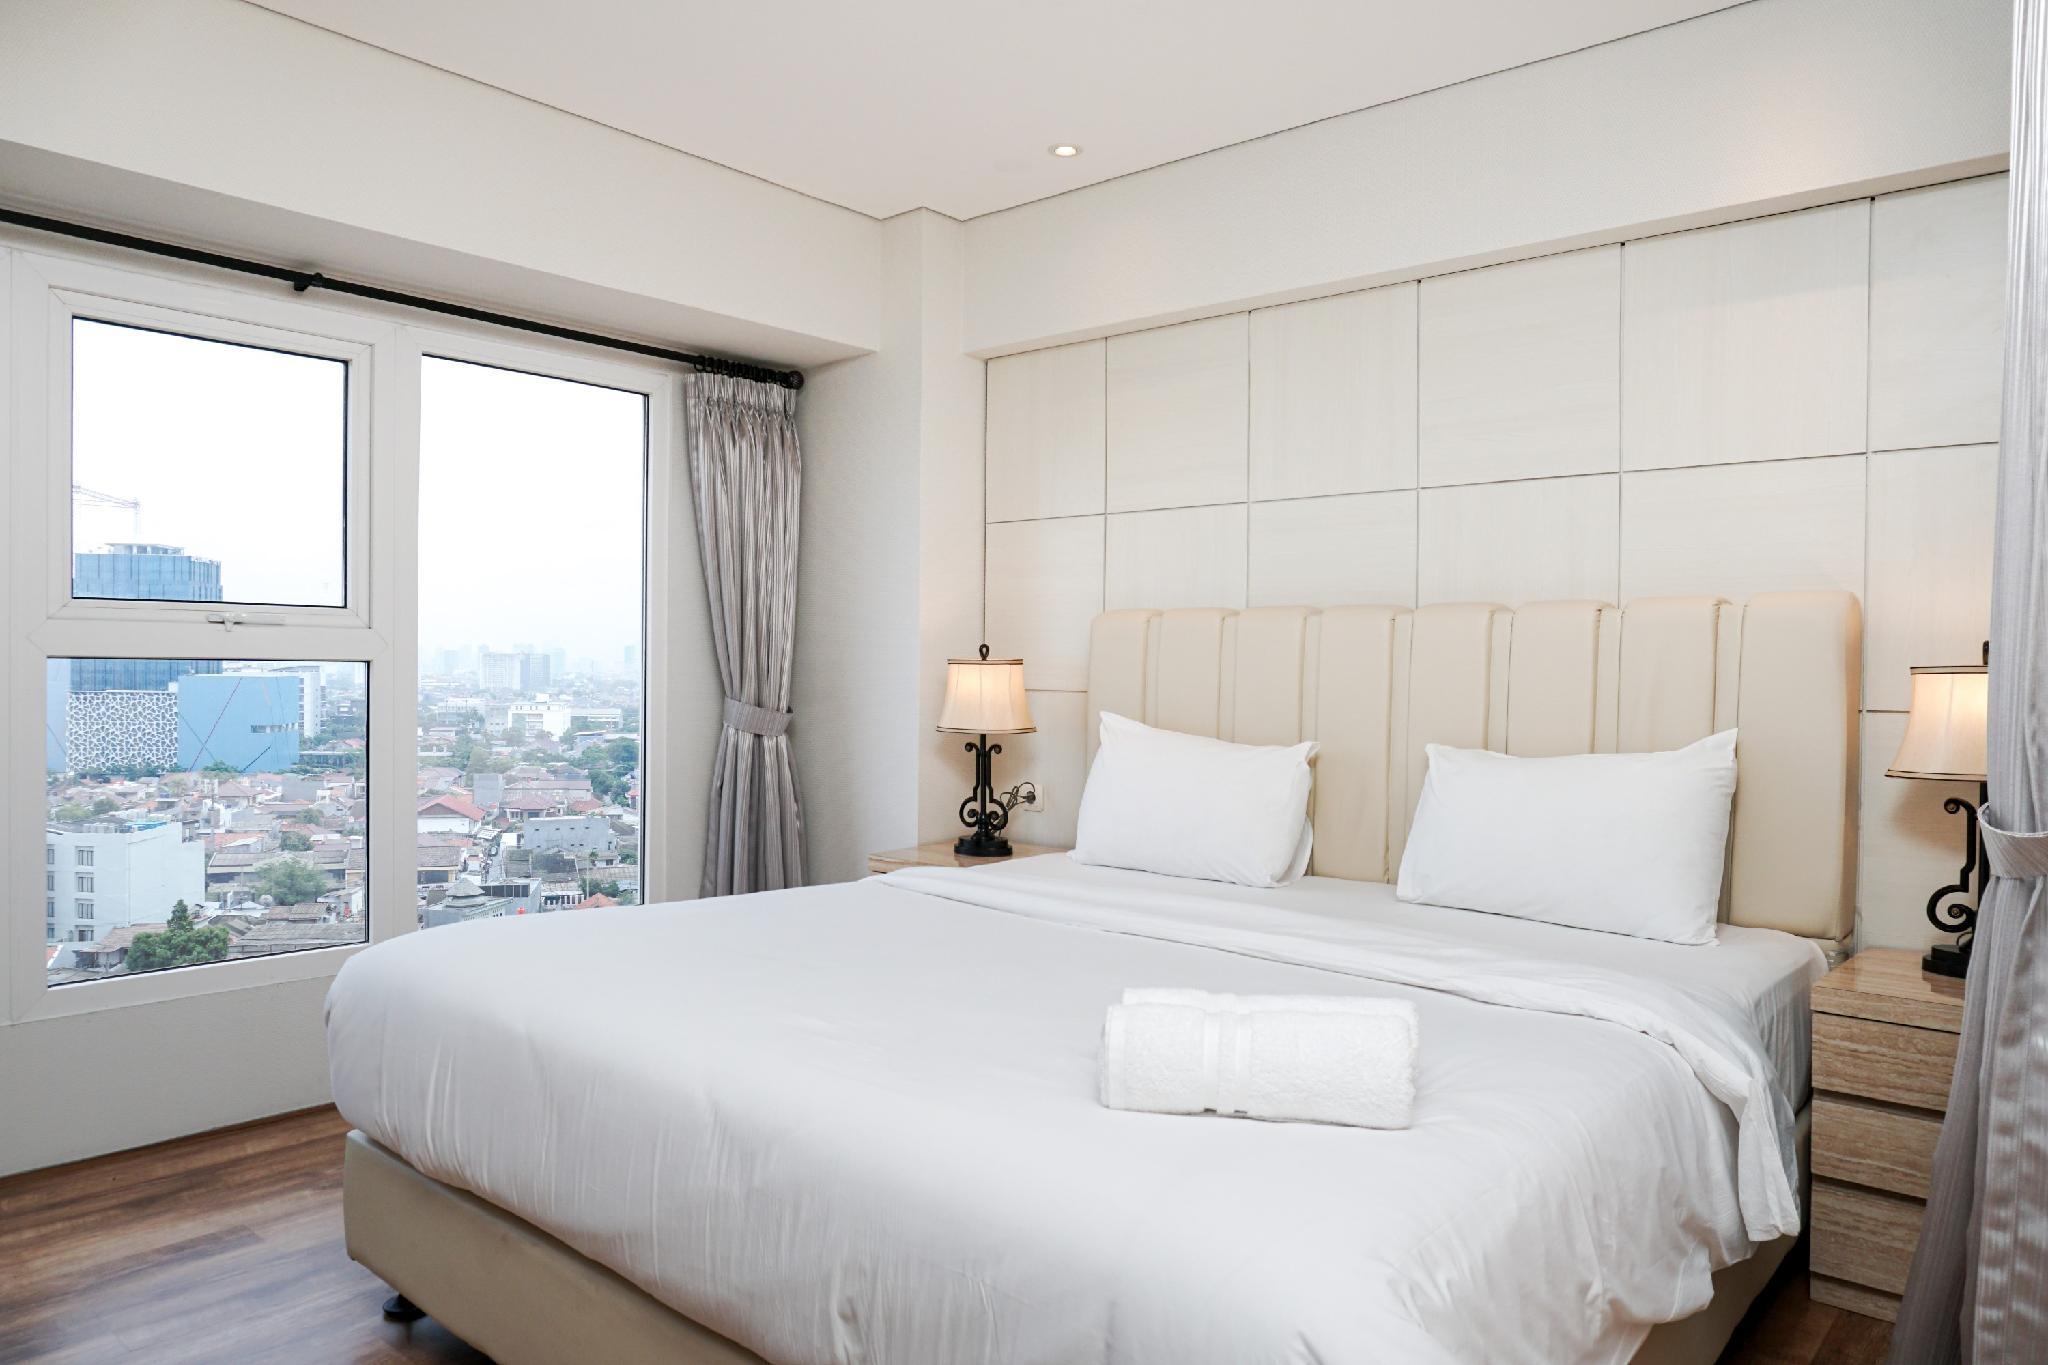 Stunning 2BR Loft At Maqna Residence By Travelio